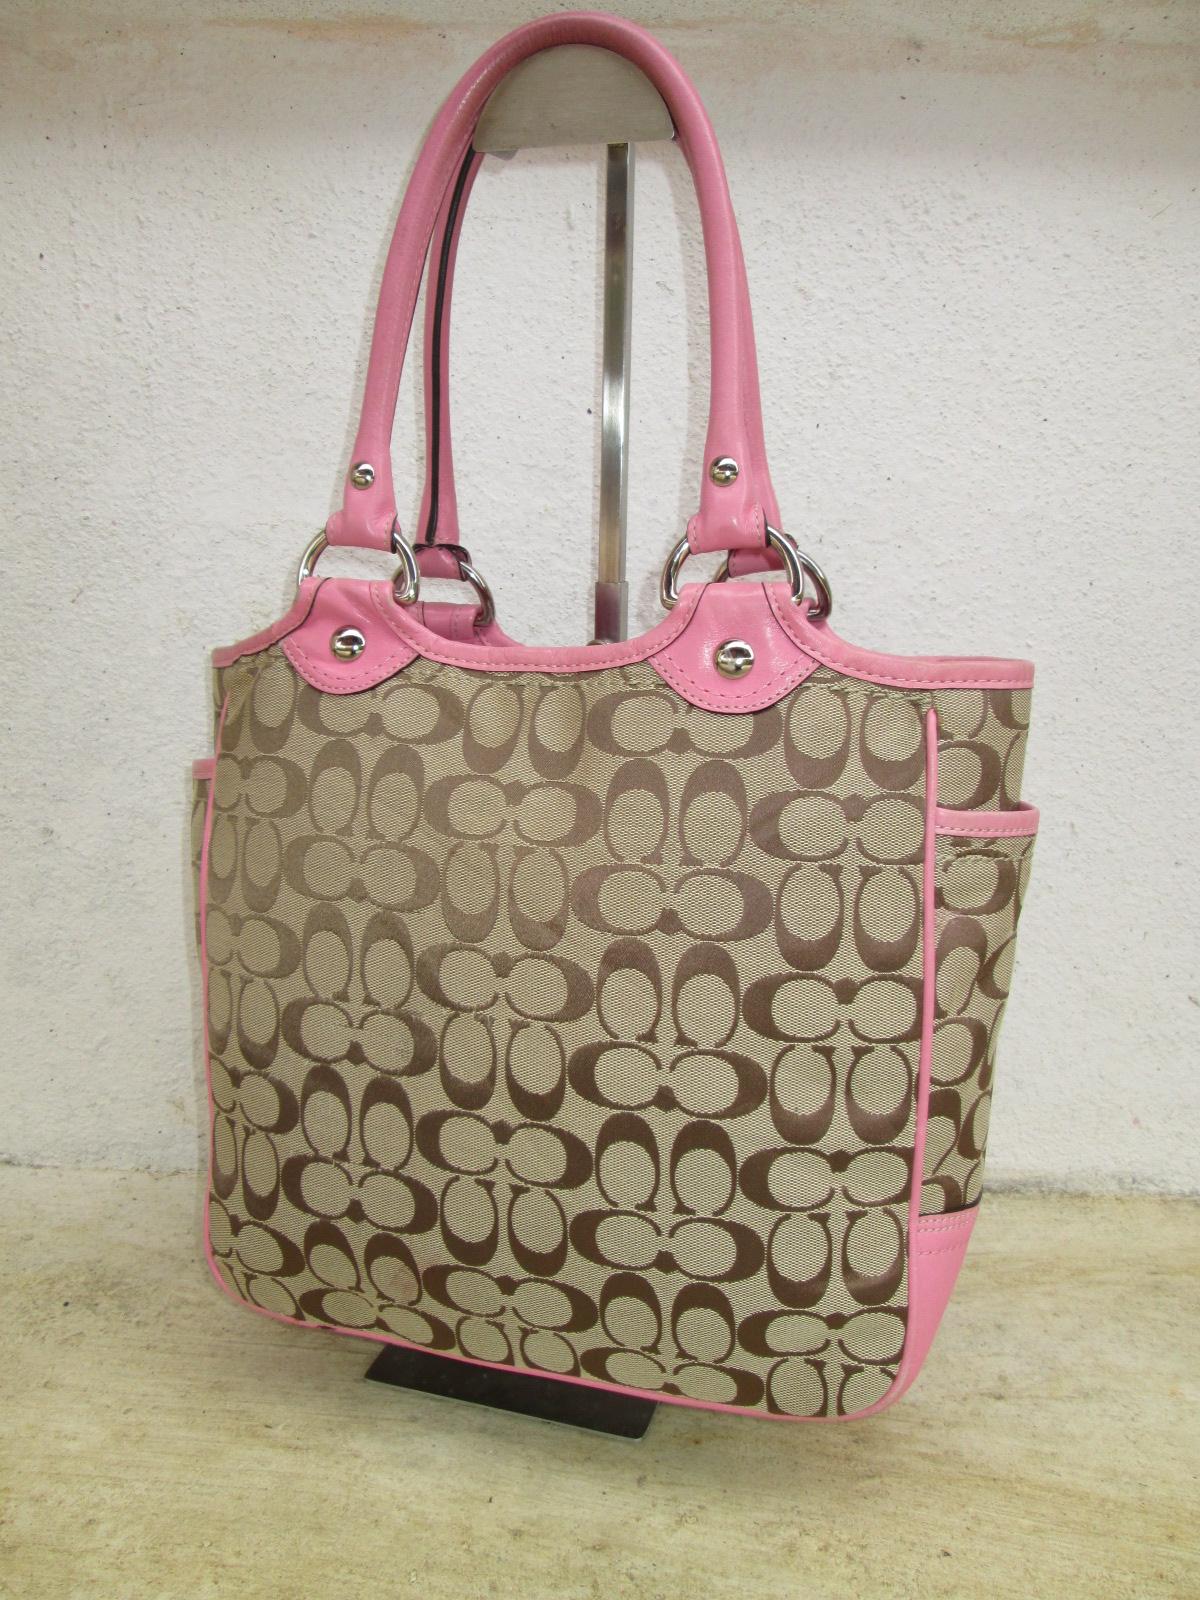 D0rayakeebag Authentic Coach Floral Applique Bleeker Khaki Signature Handbag Sold